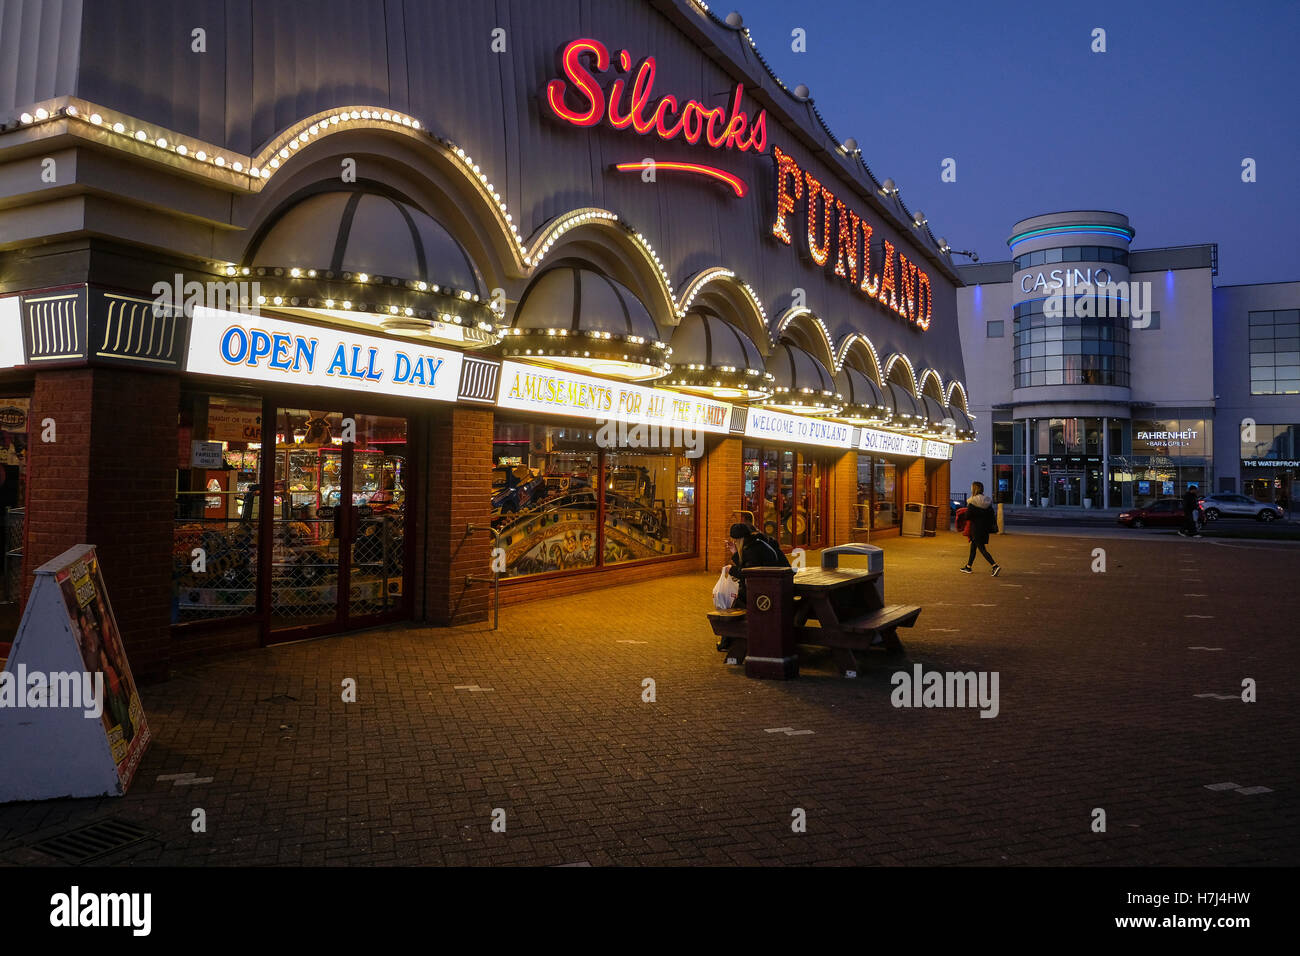 Southport Arcade - Stock Image